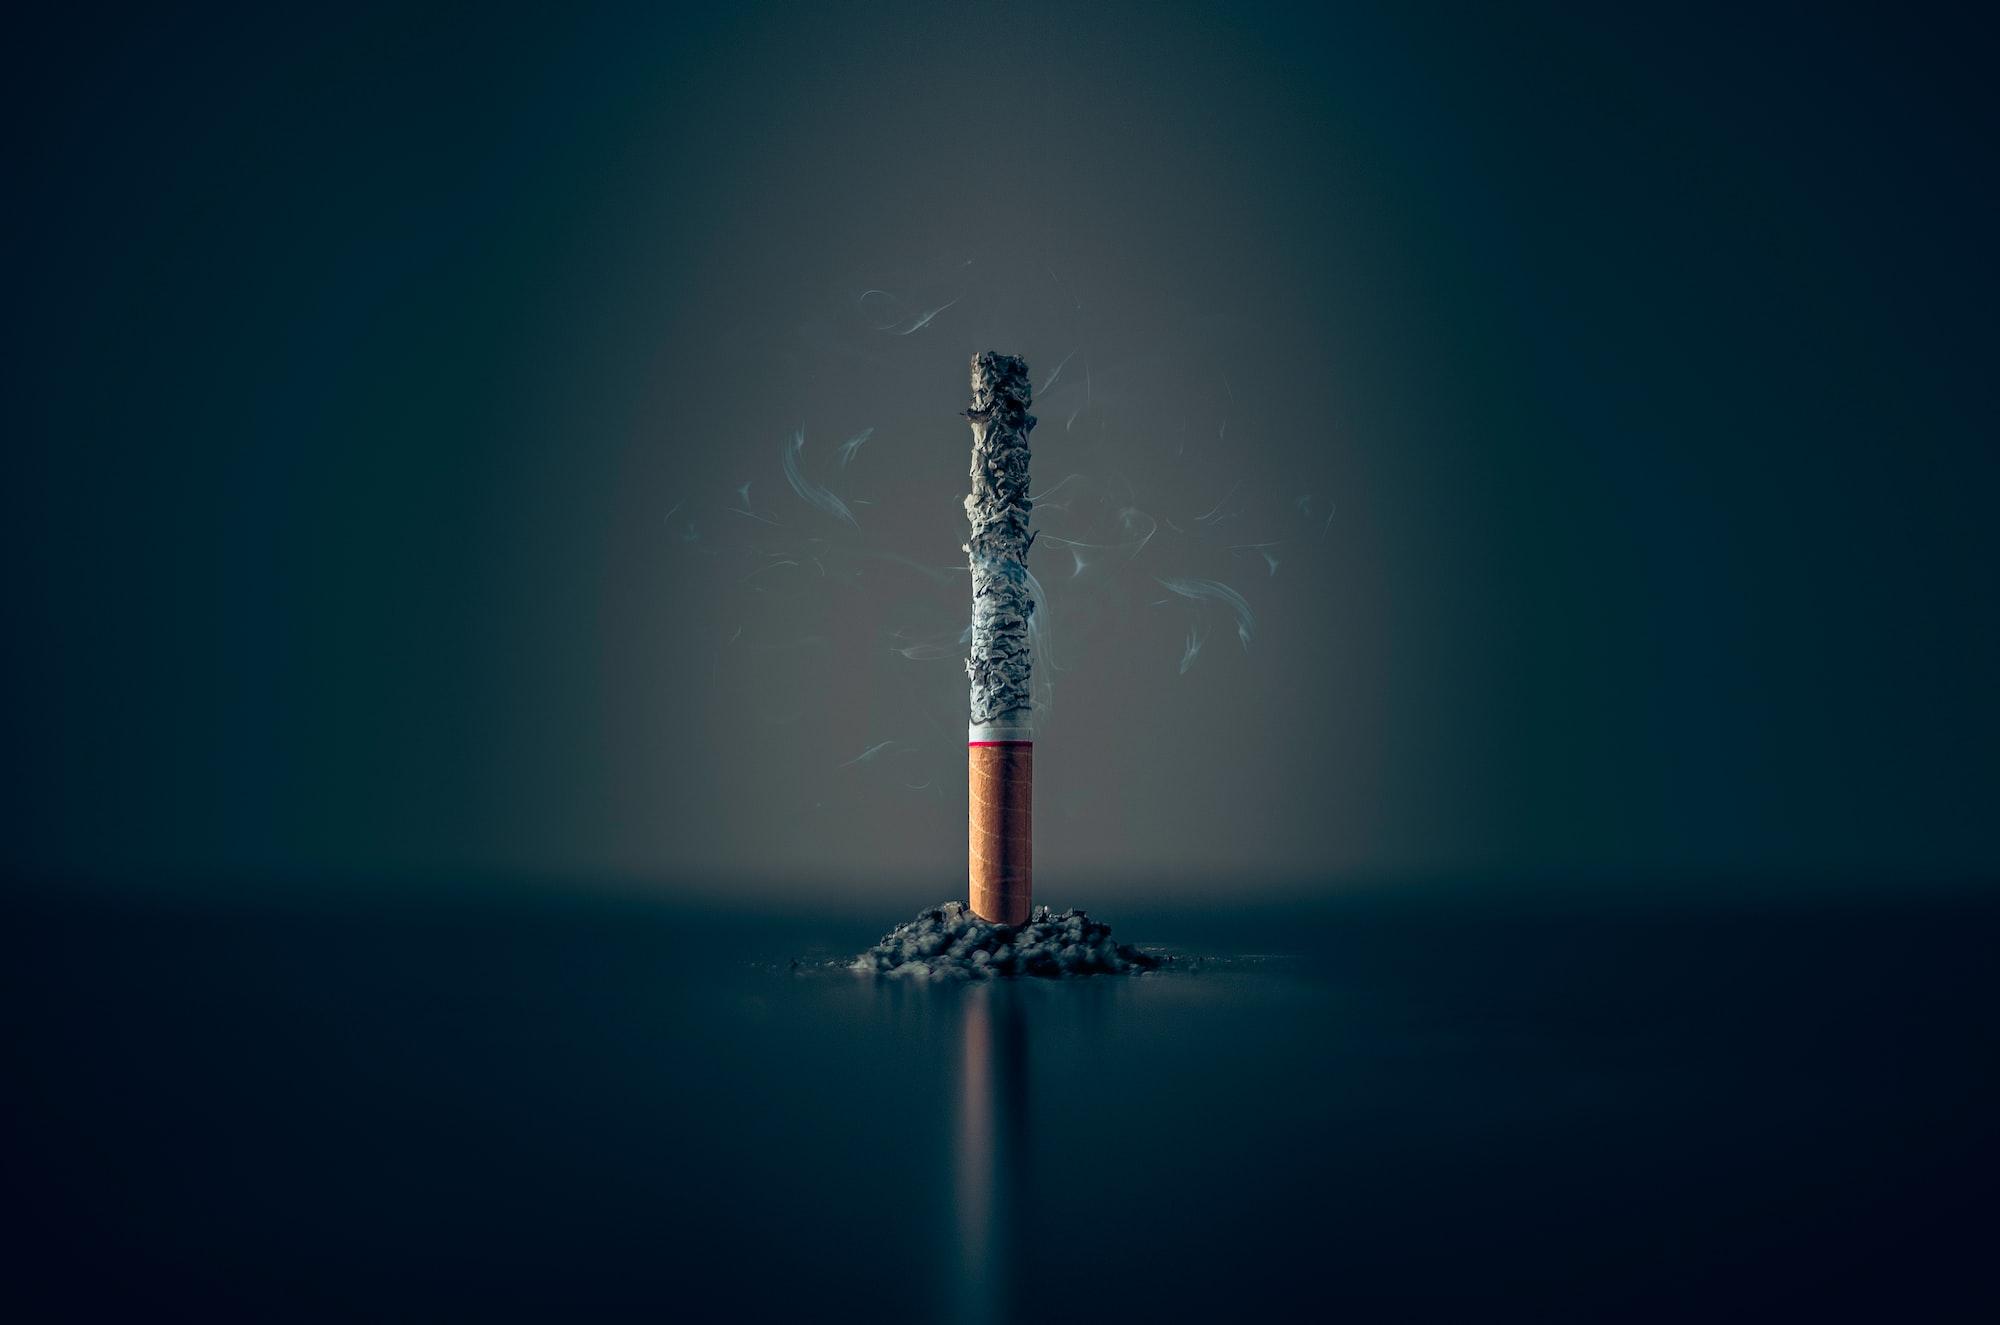 15: Cigarettes and plastic bottles